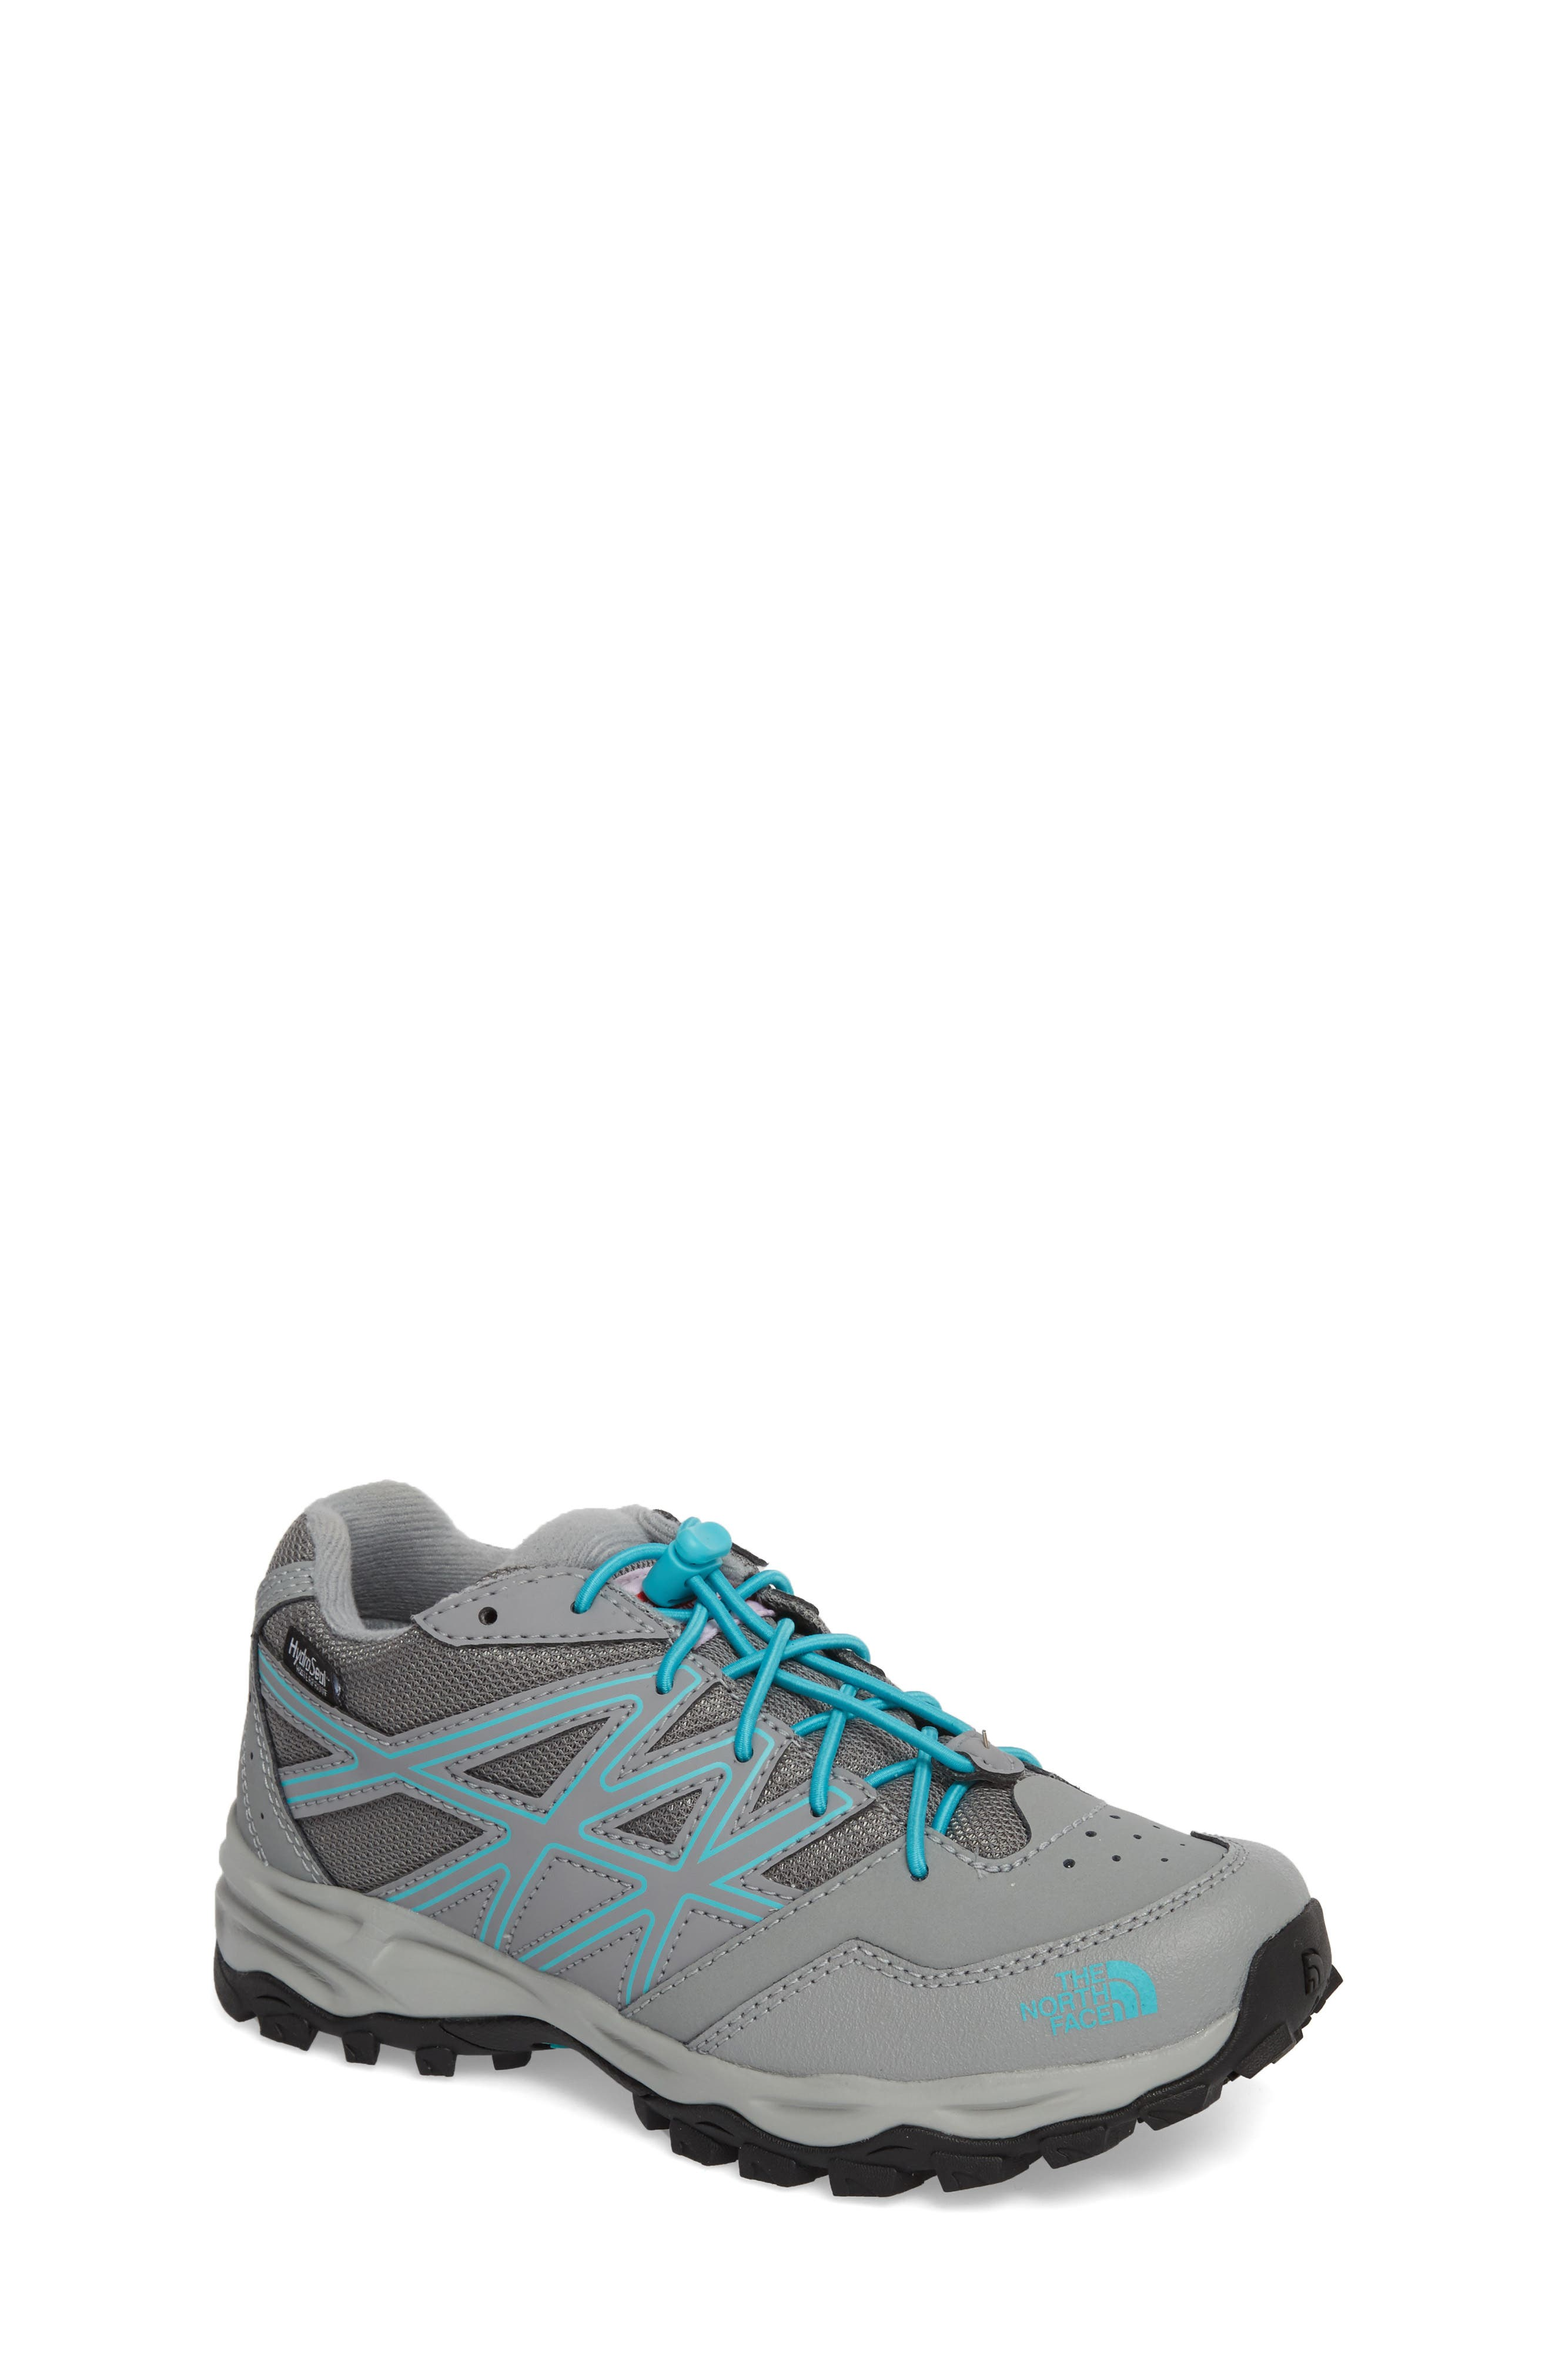 Hedgehog Hiker Boot,                         Main,                         color, 022